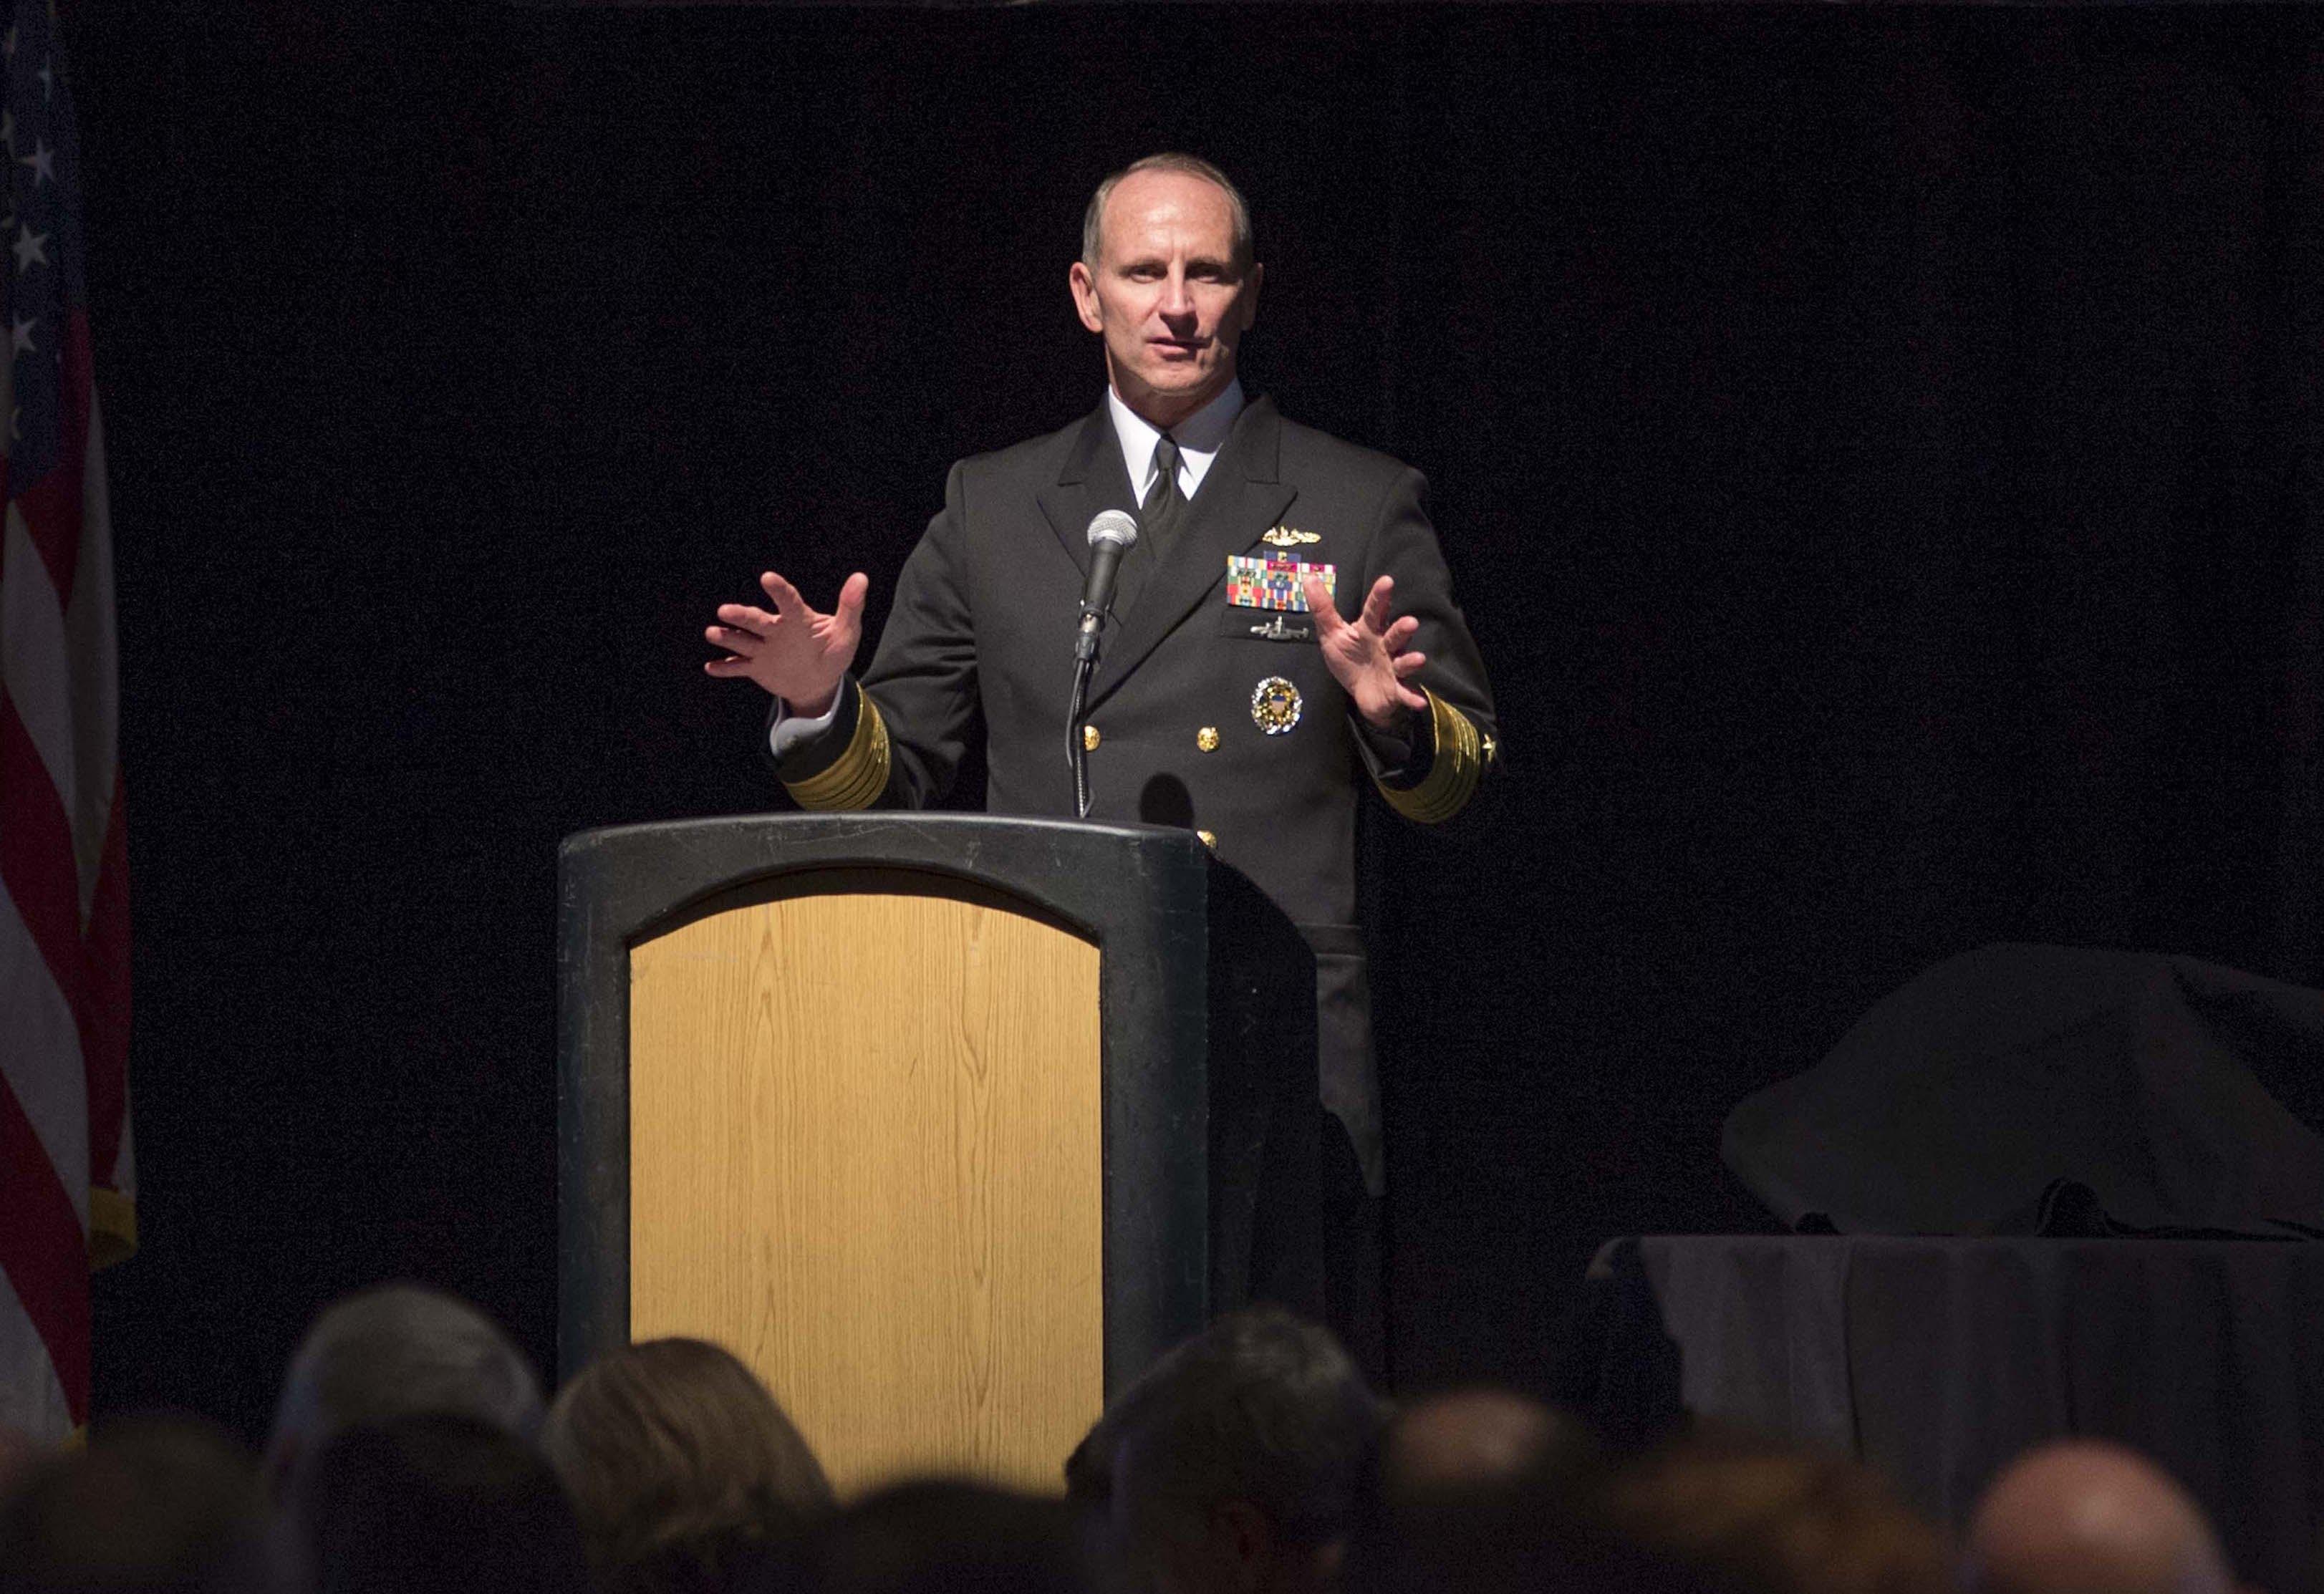 Chief of Naval Operations (CNO) Adm. Jonathan Greenert speaks at the Annual Hampton Roads Navy League Dinner on Jan. 28, 2015.